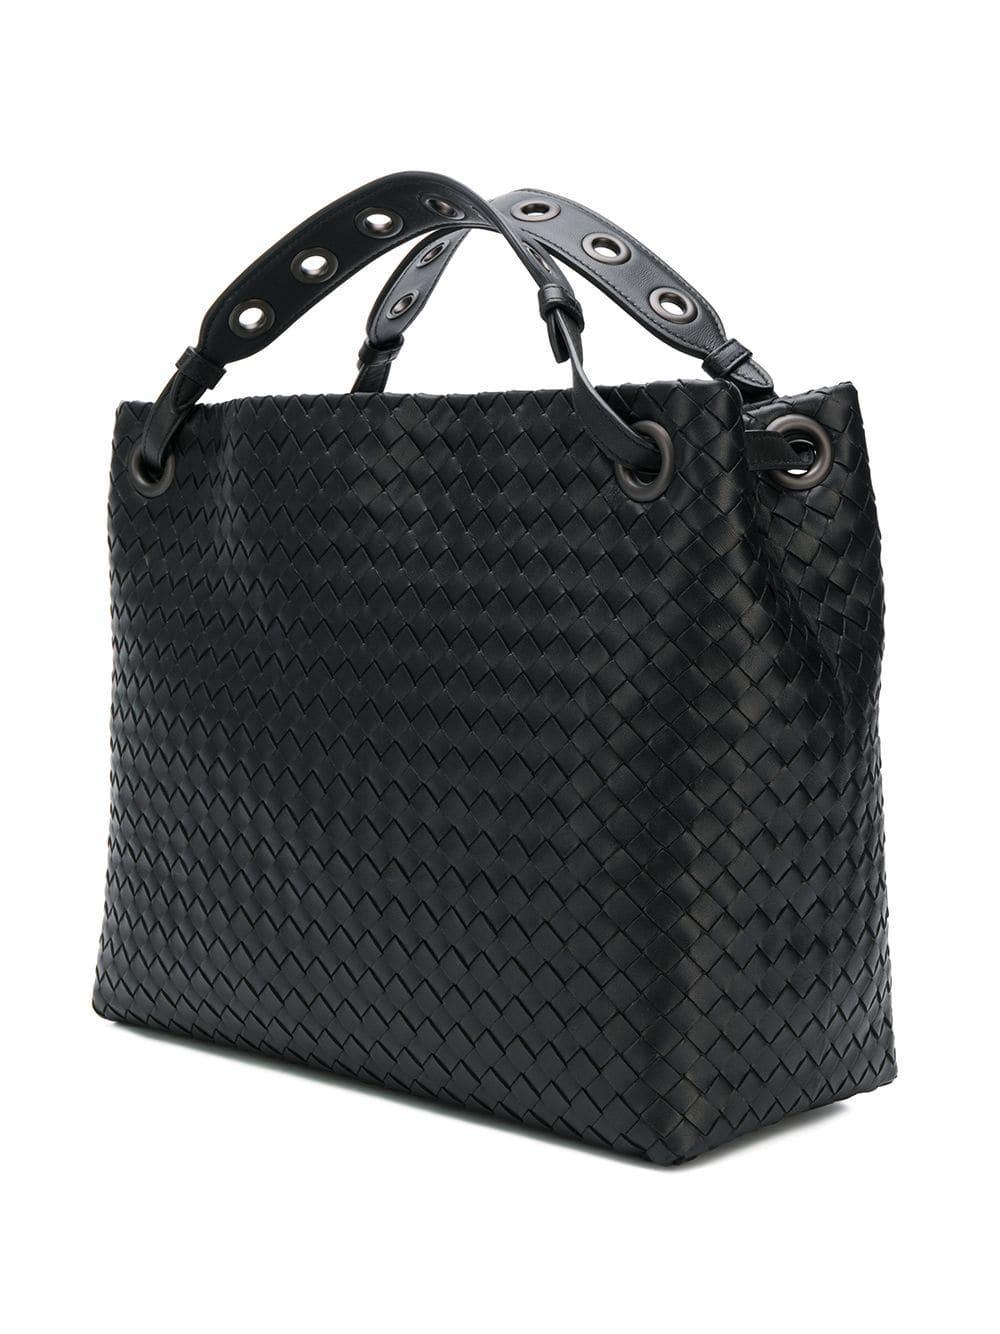 6e0fa3a531 Bottega Veneta Garda Tote Bag in Black - Lyst